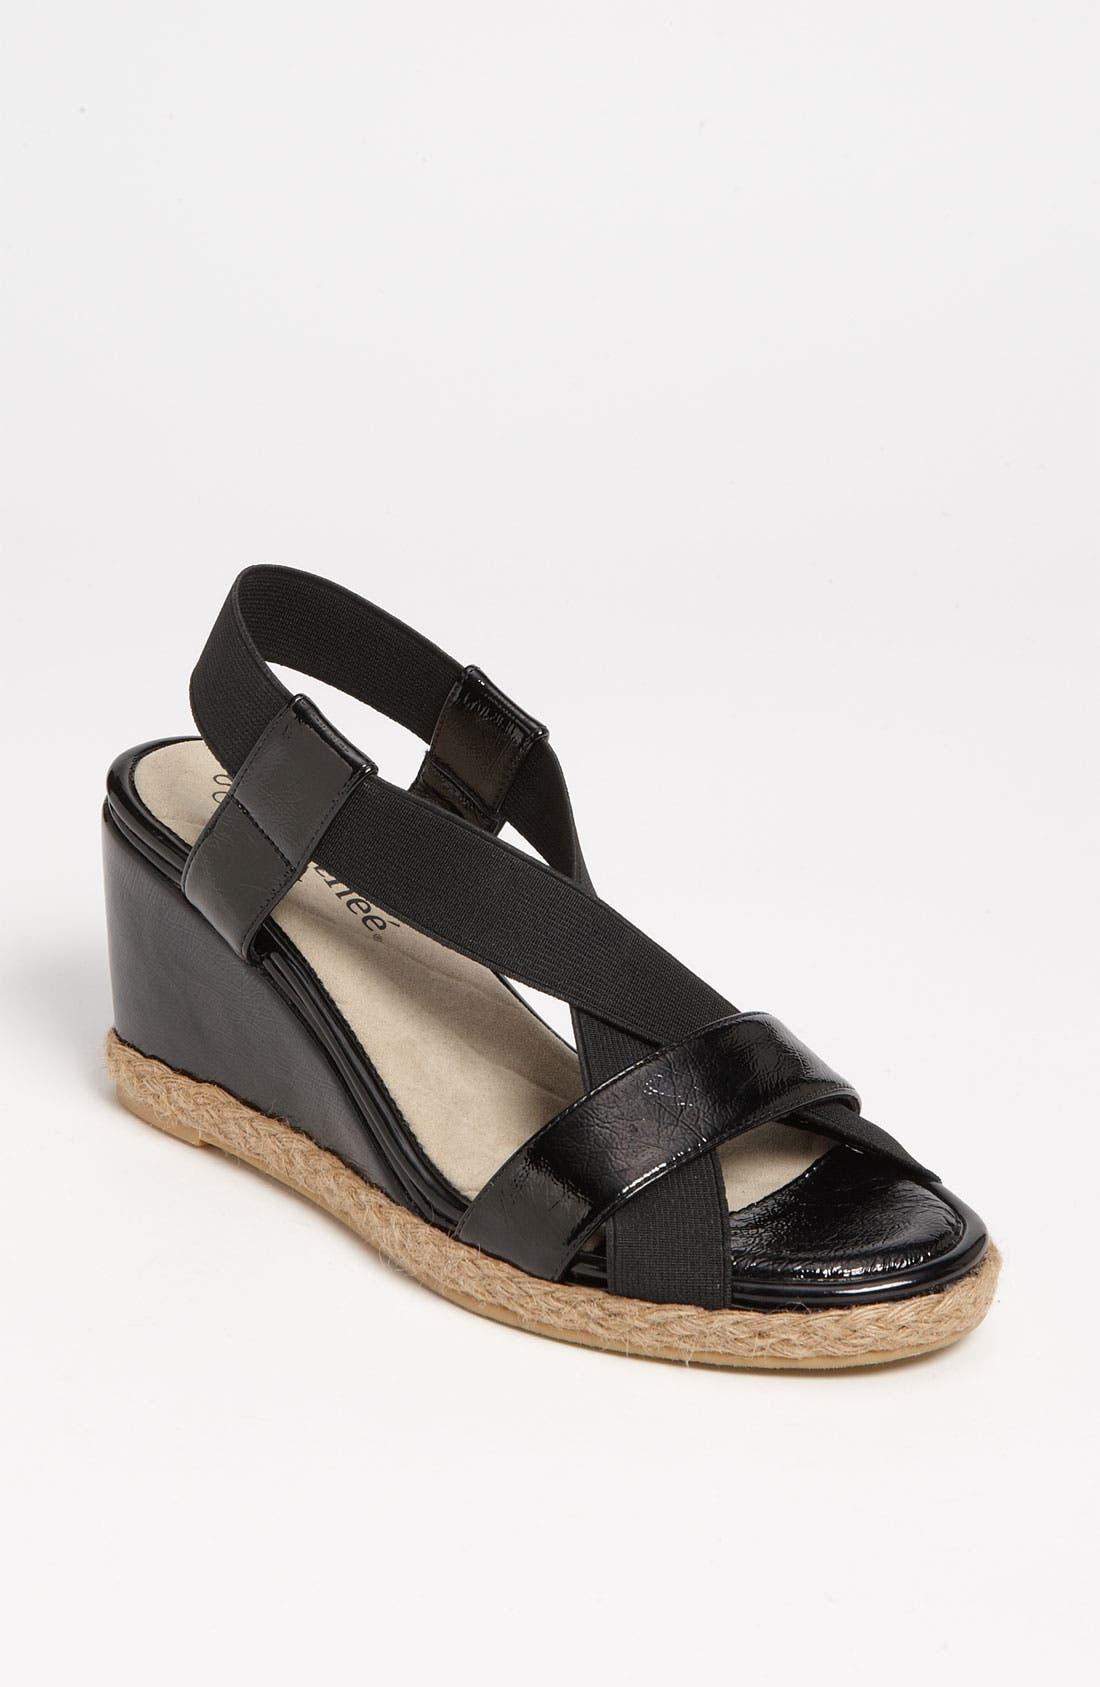 Alternate Image 1 Selected - J. Reneé 'Halina' Sandal